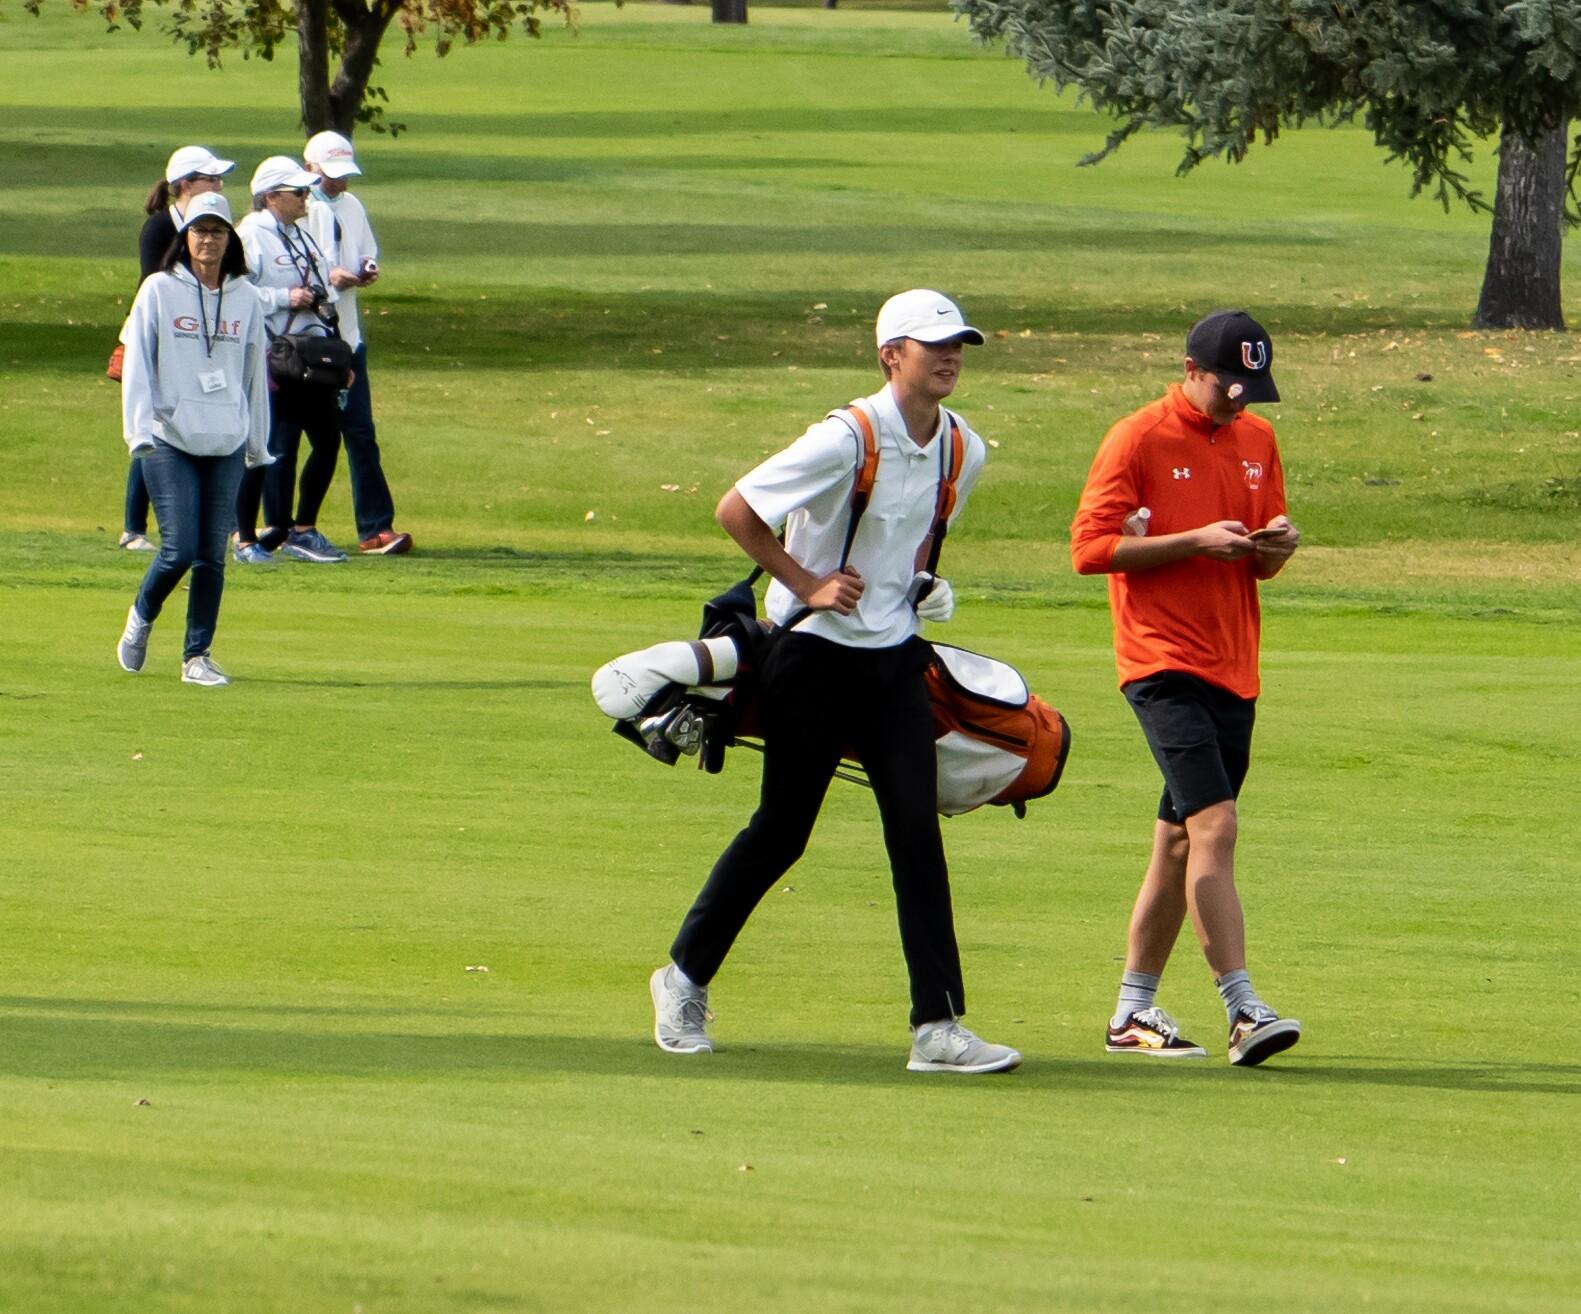 Billings Senior golfers.jpg